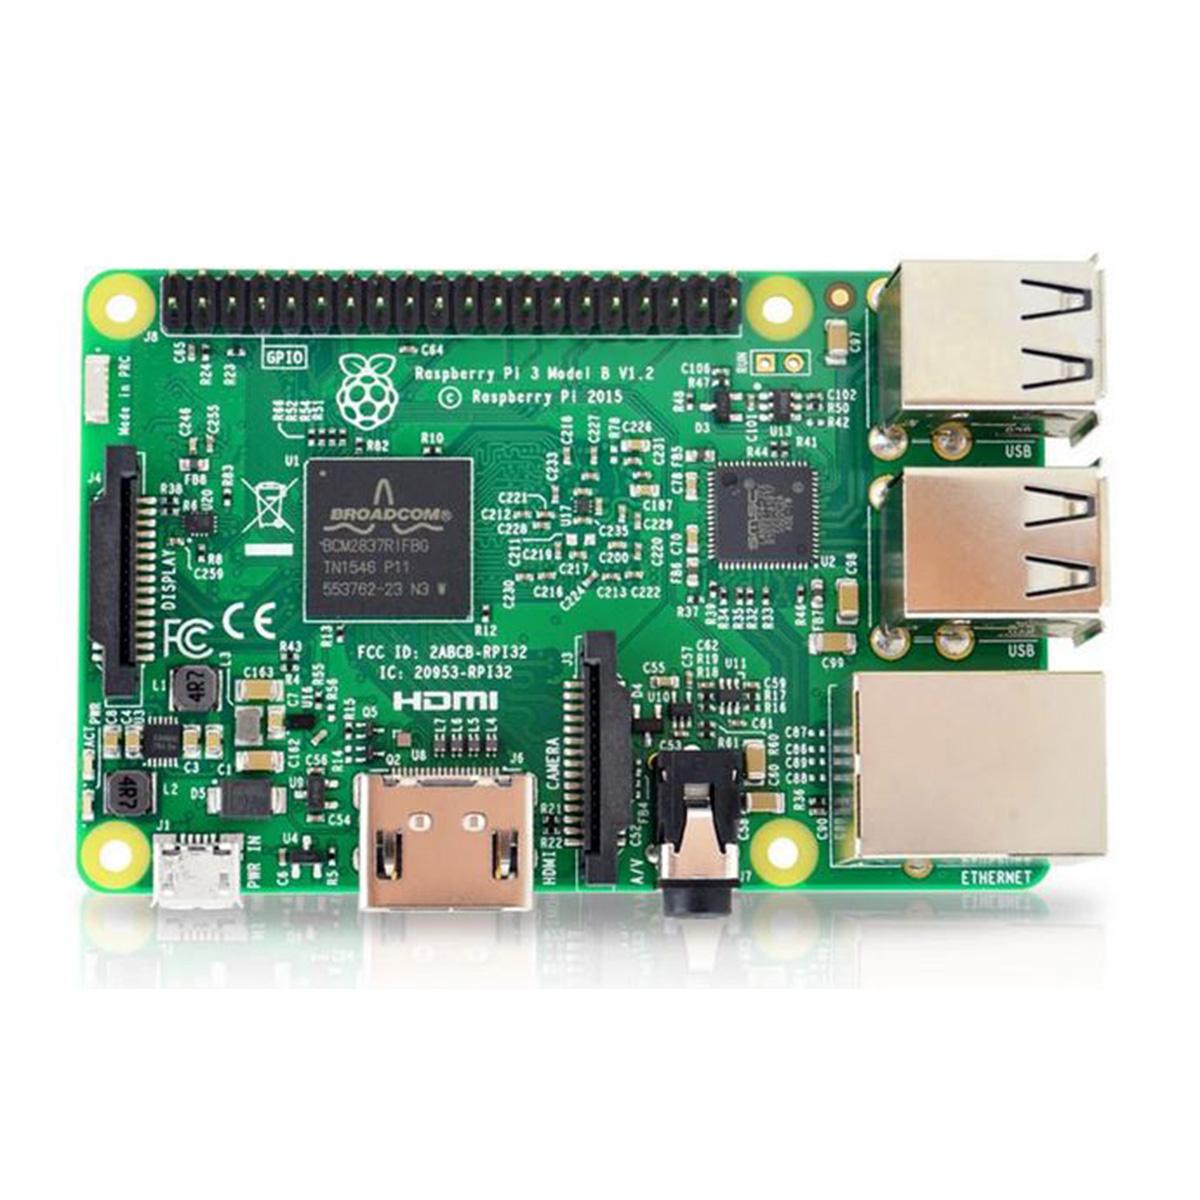 Raspberry - Pi 3 - Model B - Quadcore 1.2ghz - 1GB RAM